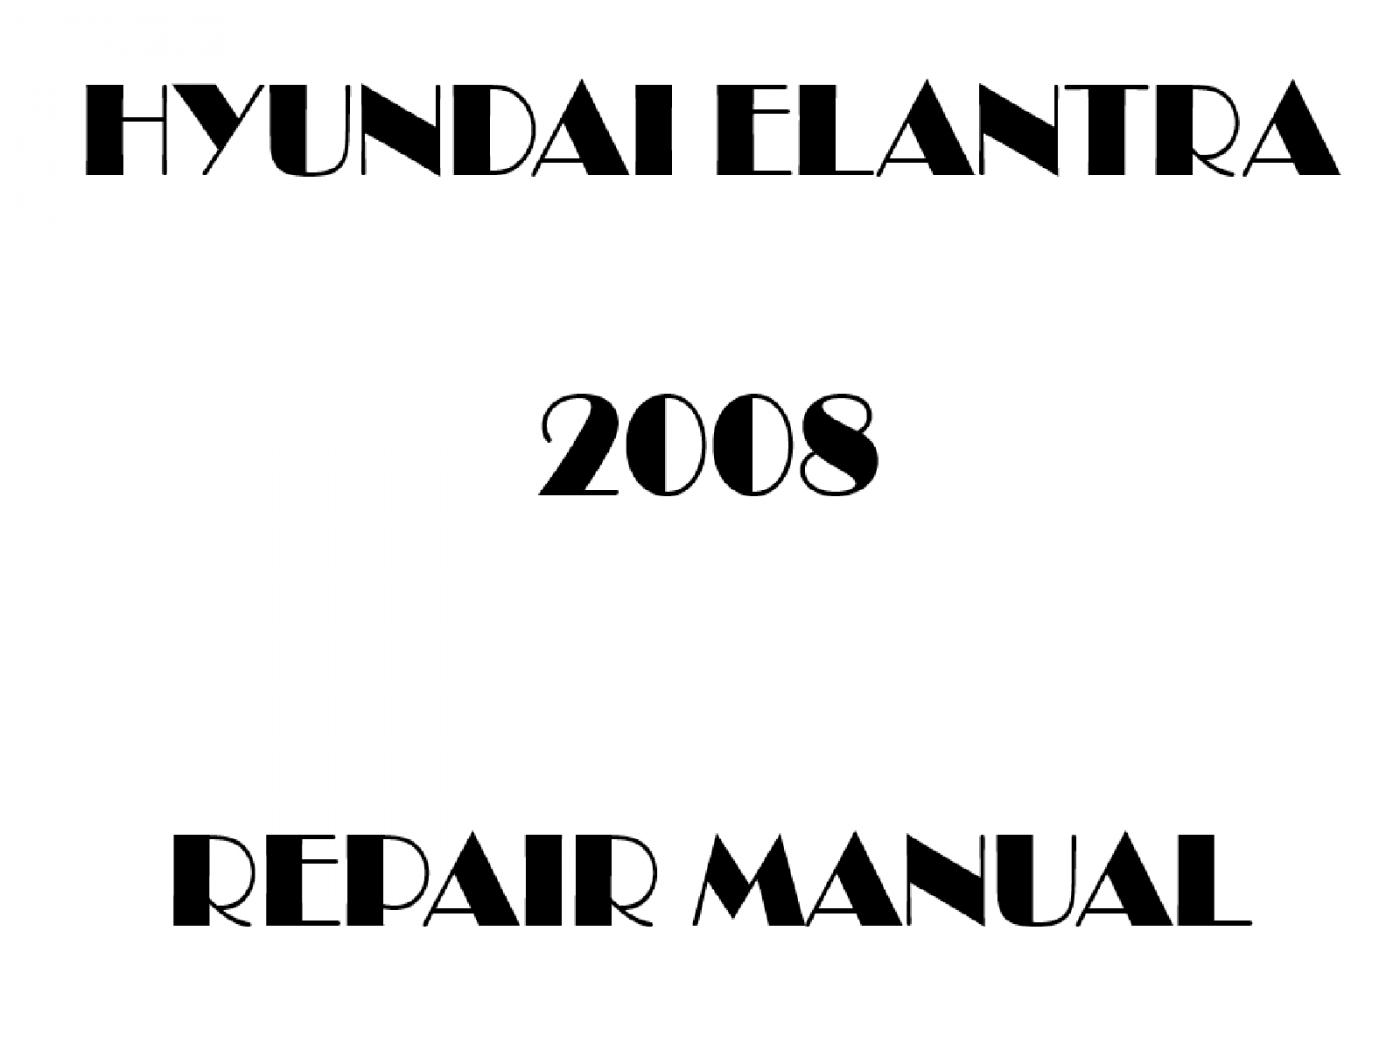 2008 Hyundai Elantra repair manual